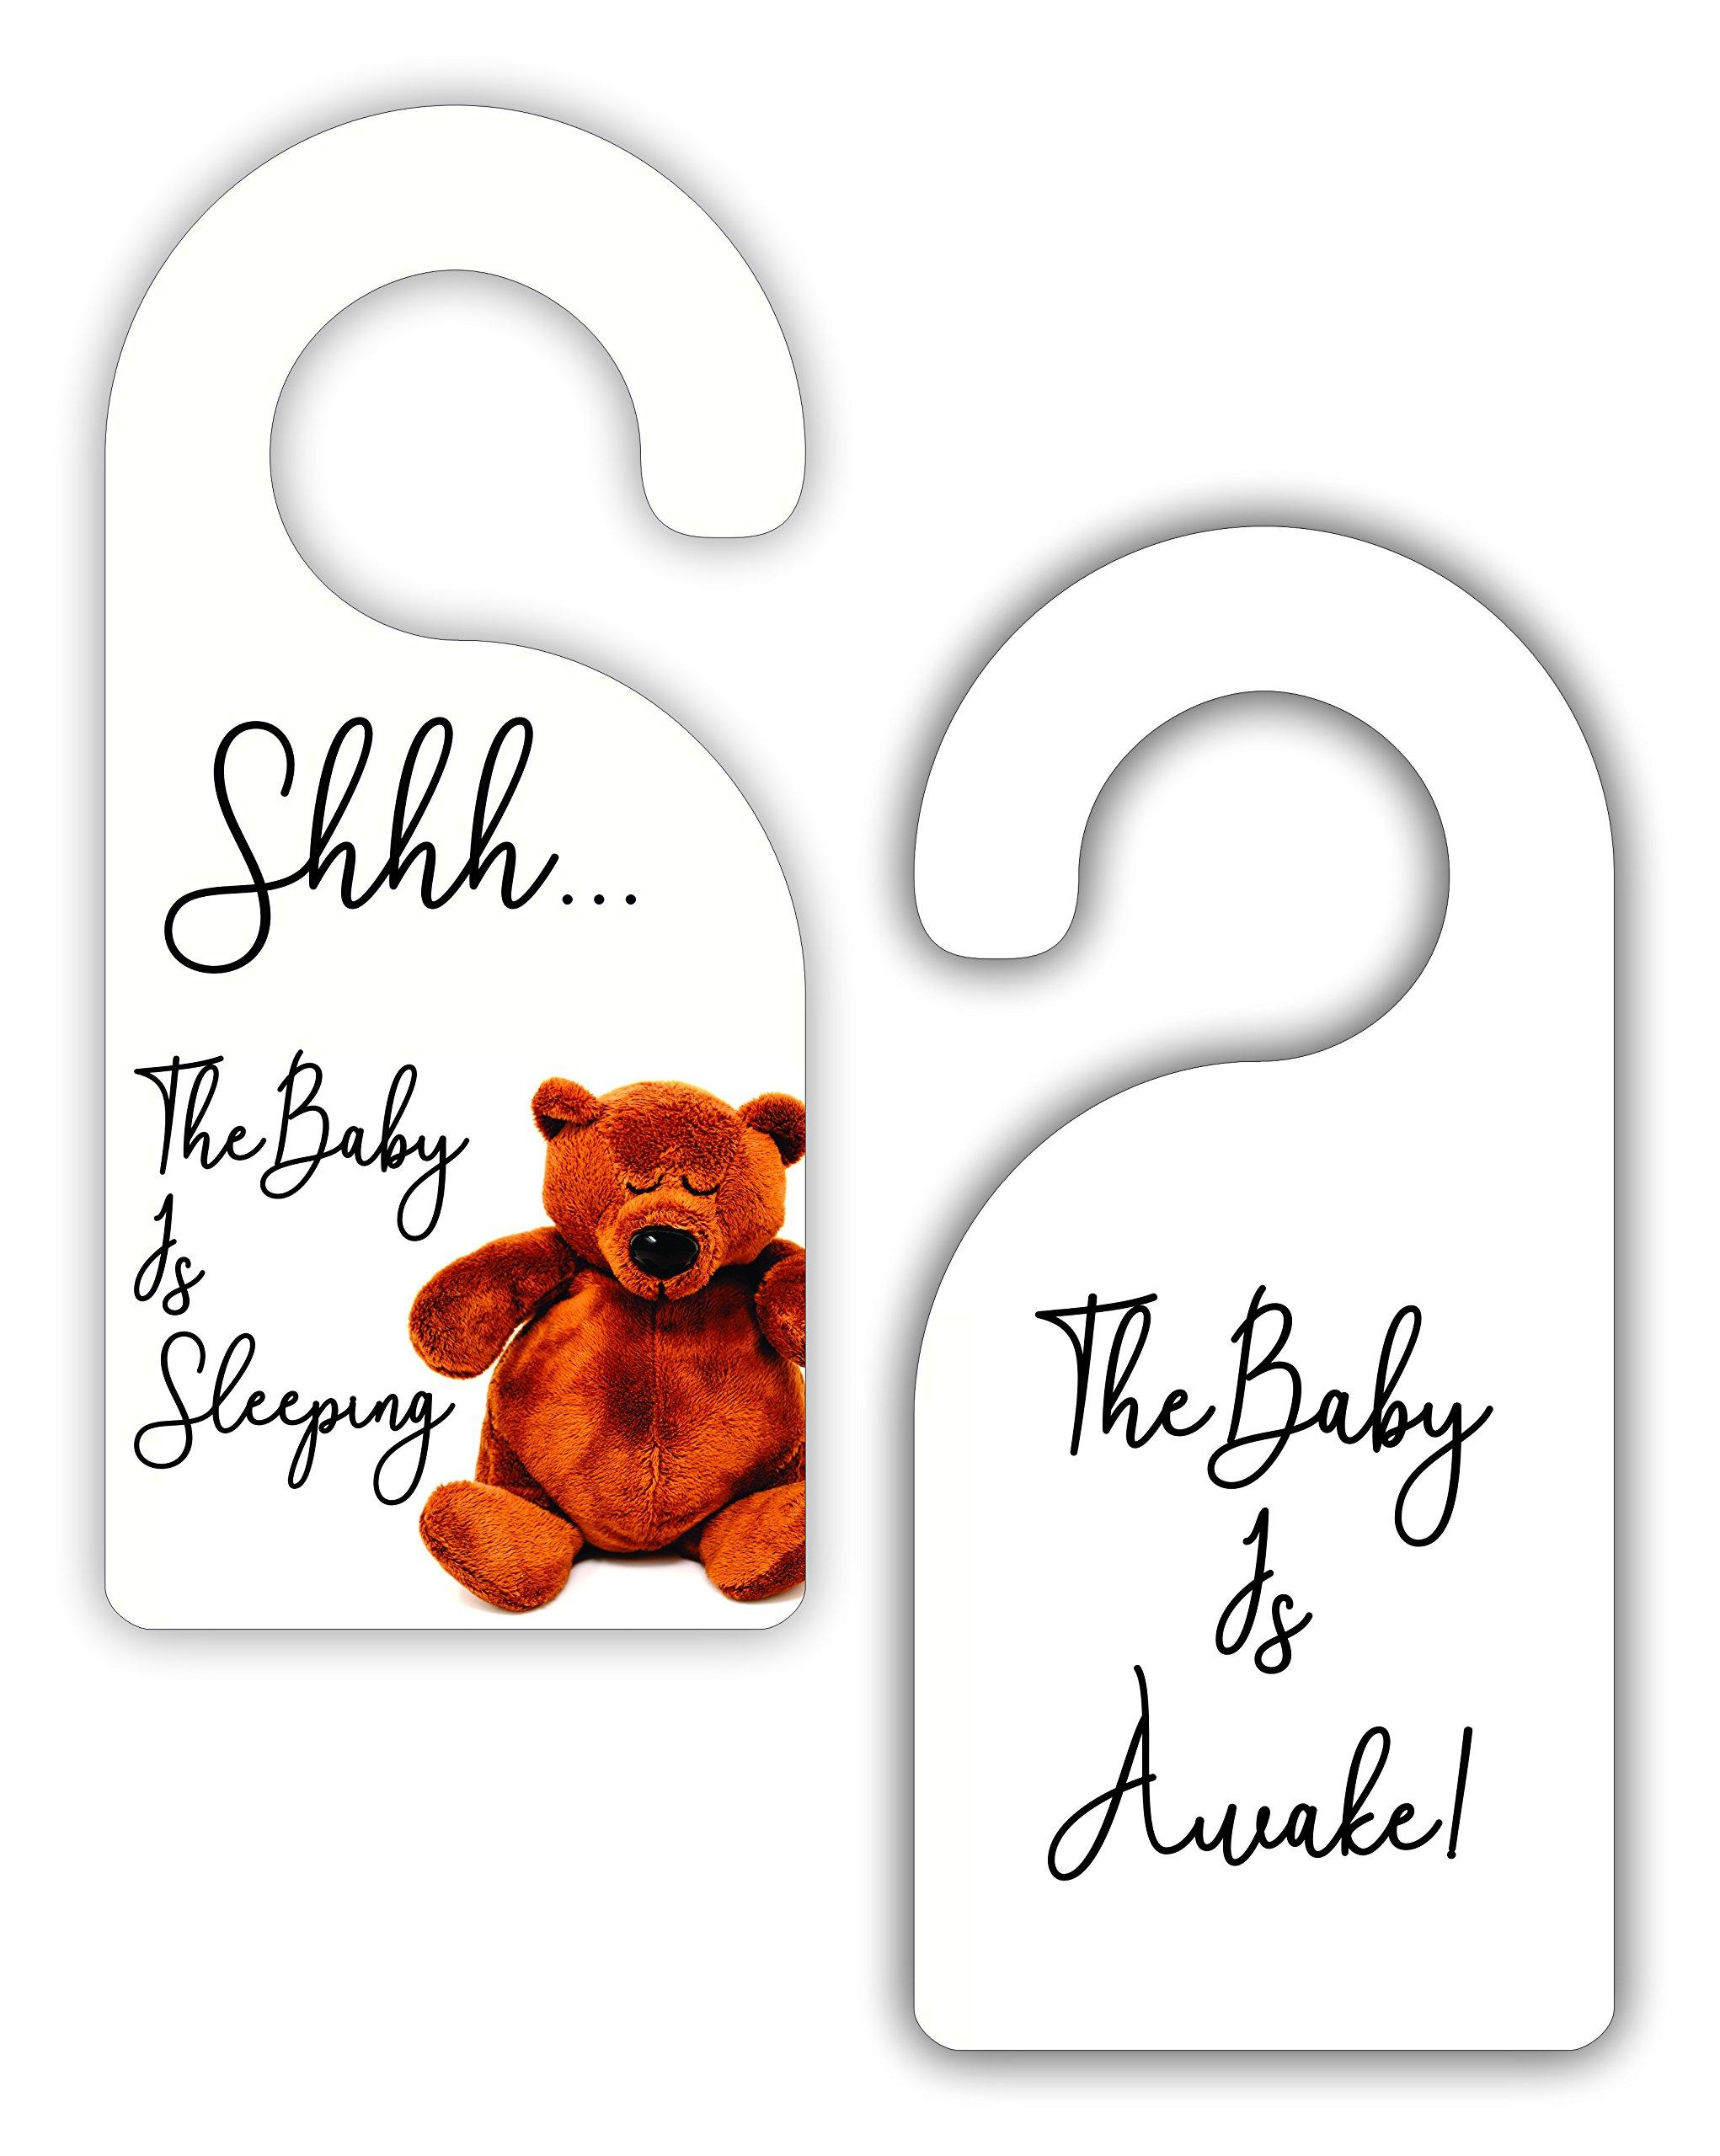 Sleeping Baby Nursery Room Door Sign Hanger - Double Sided - Hard Plastic - Glossy Finish